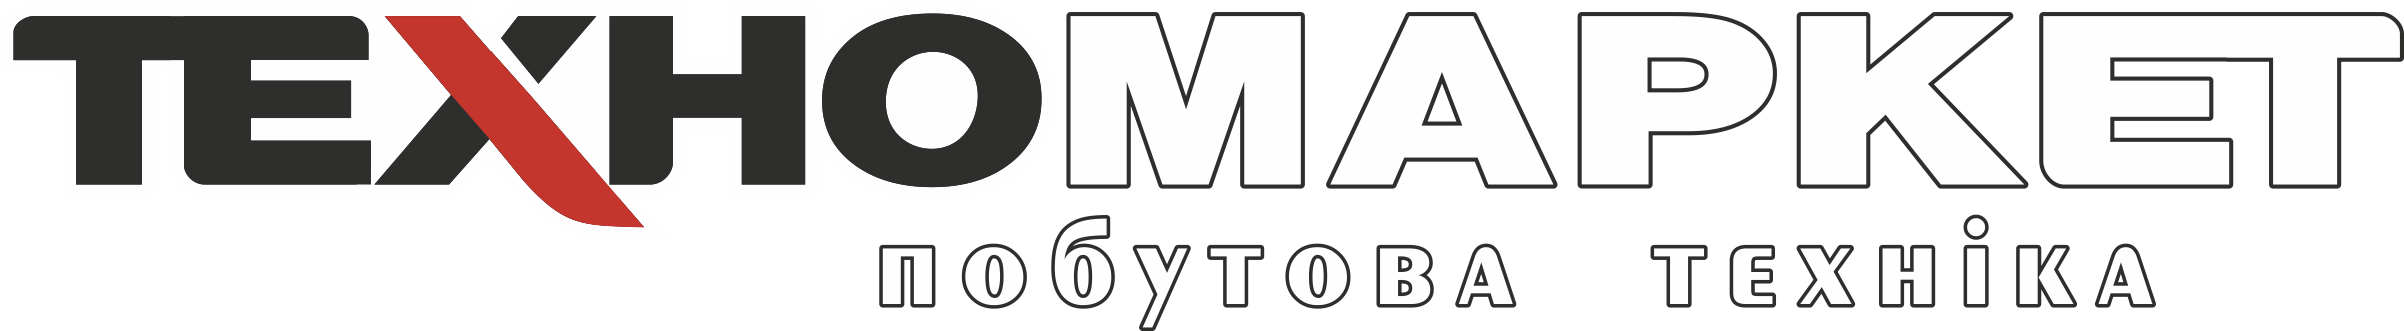 ТЕХНОМАРКЕТ